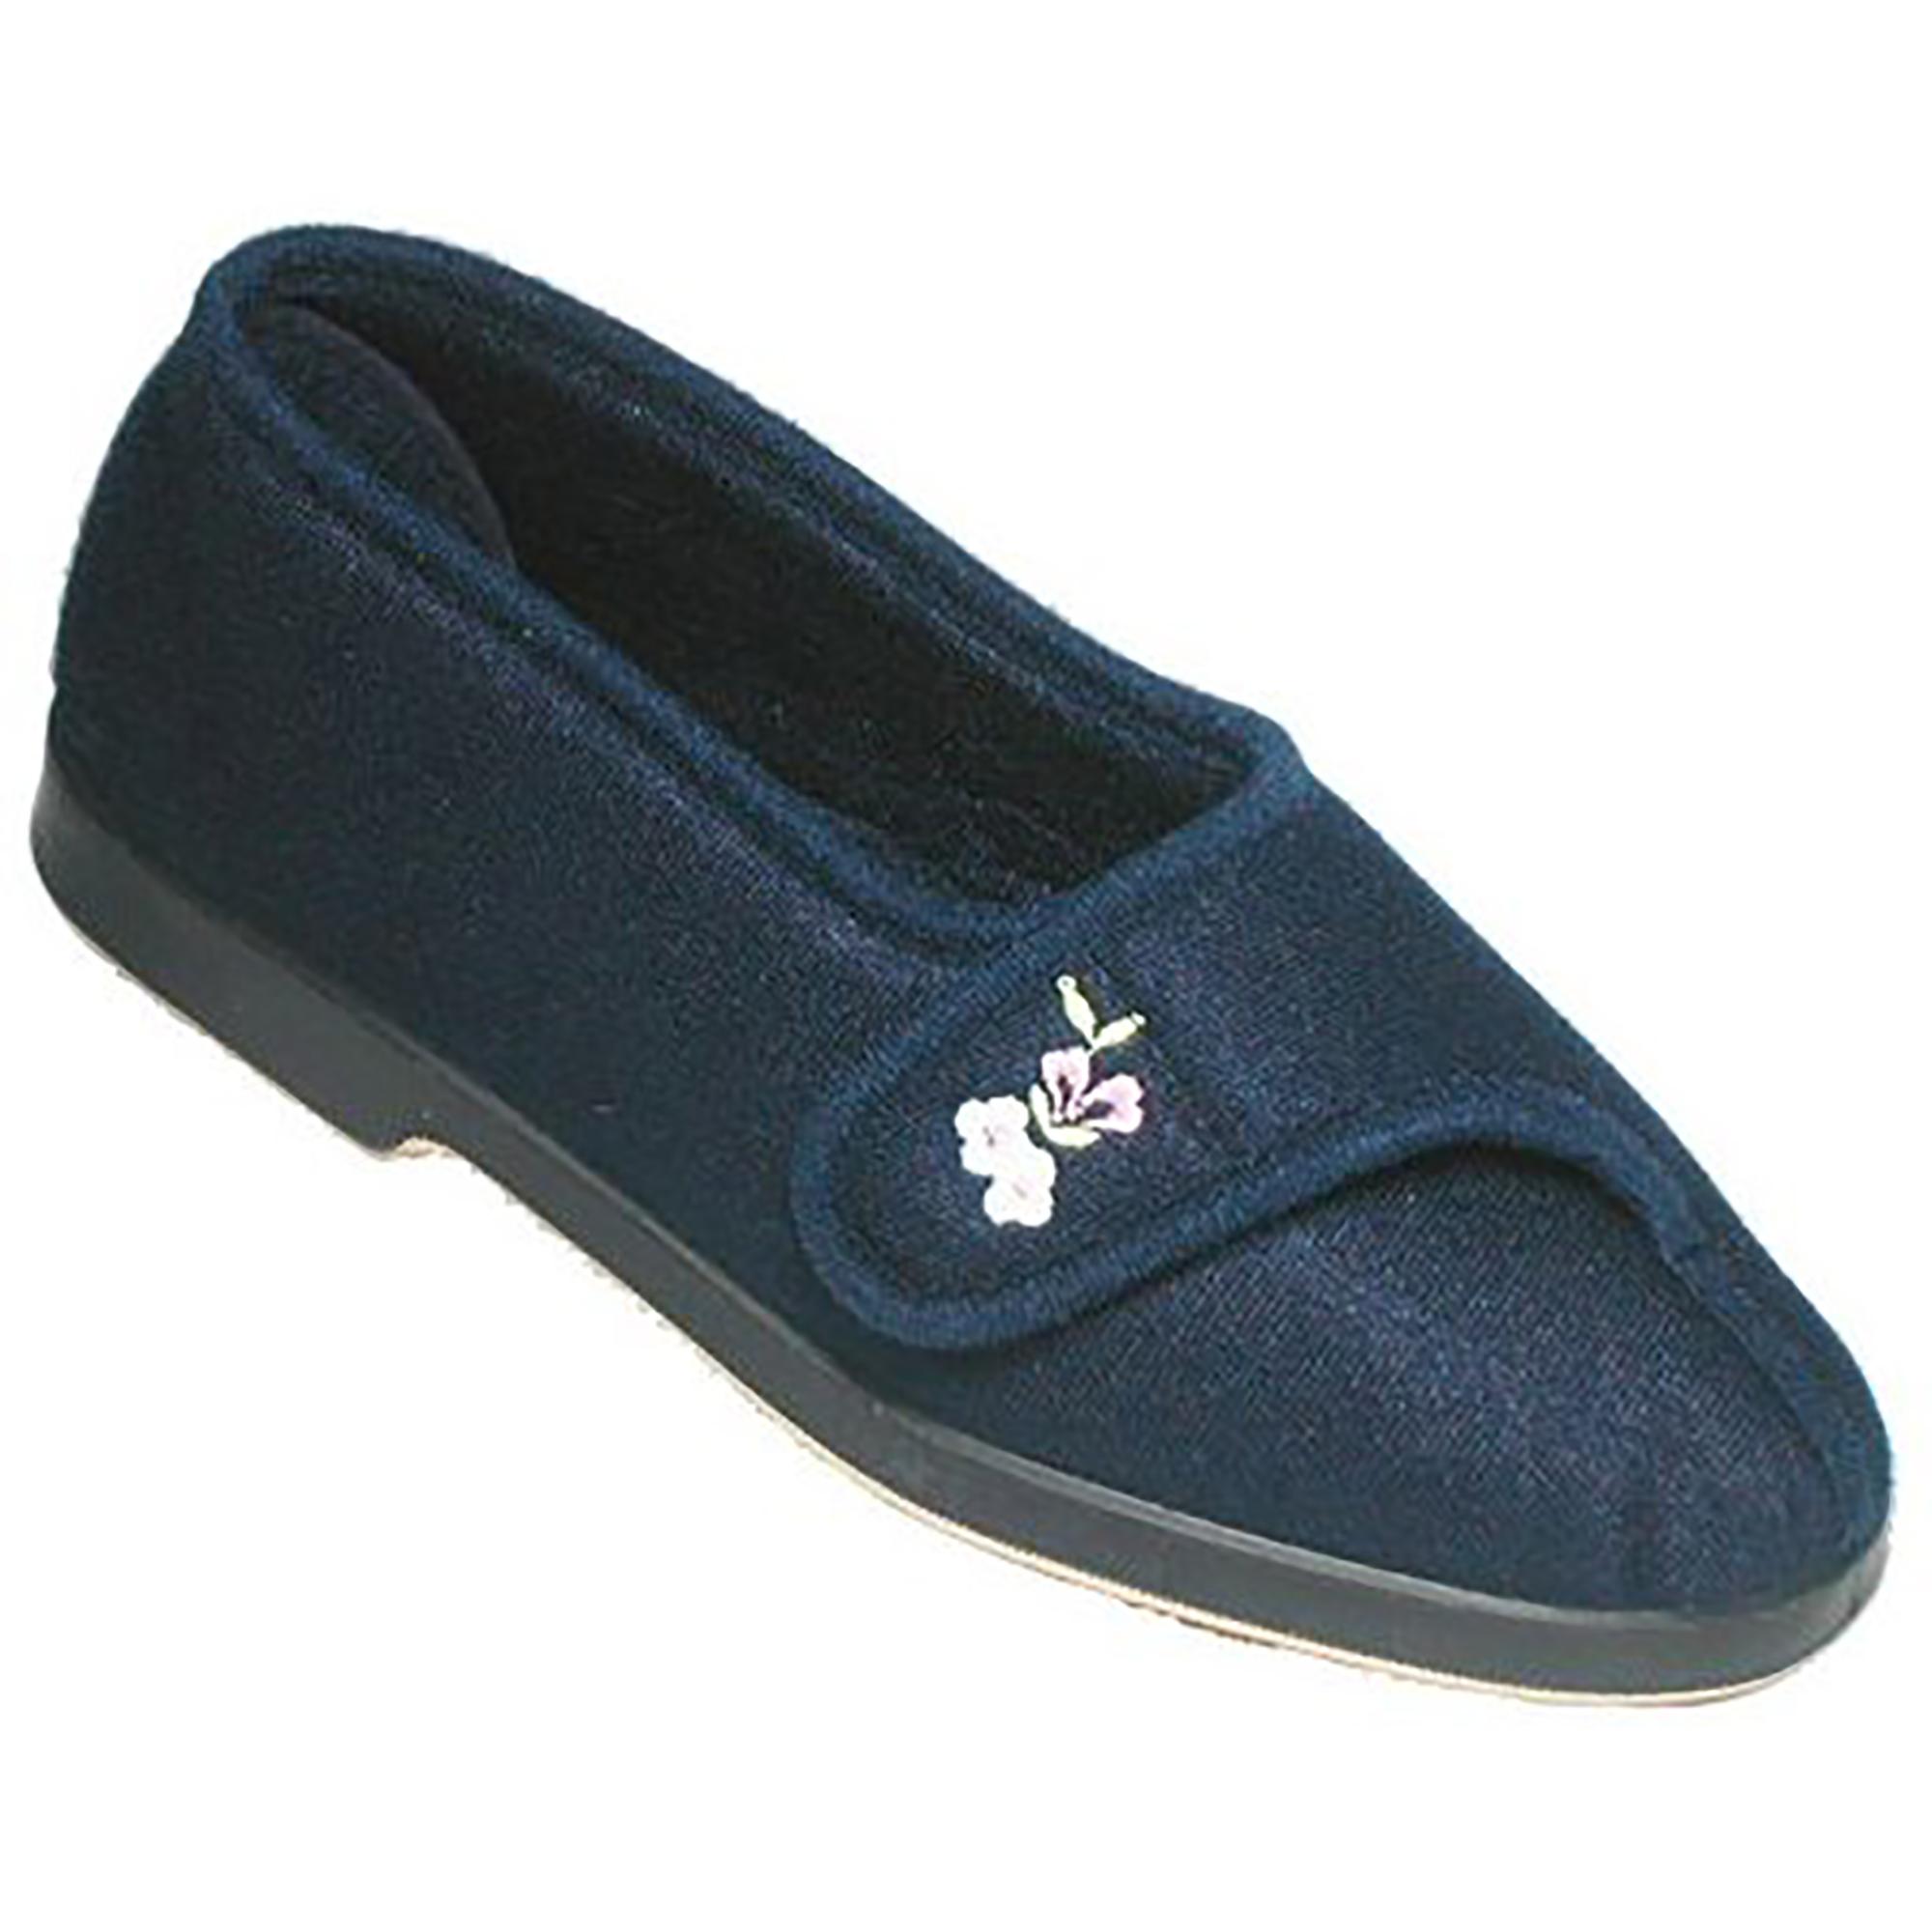 GBS Winnie Wide Fit Womens /Ladies Indoor House Slipper Shoes /Slippers Szs 5-11 | EBay